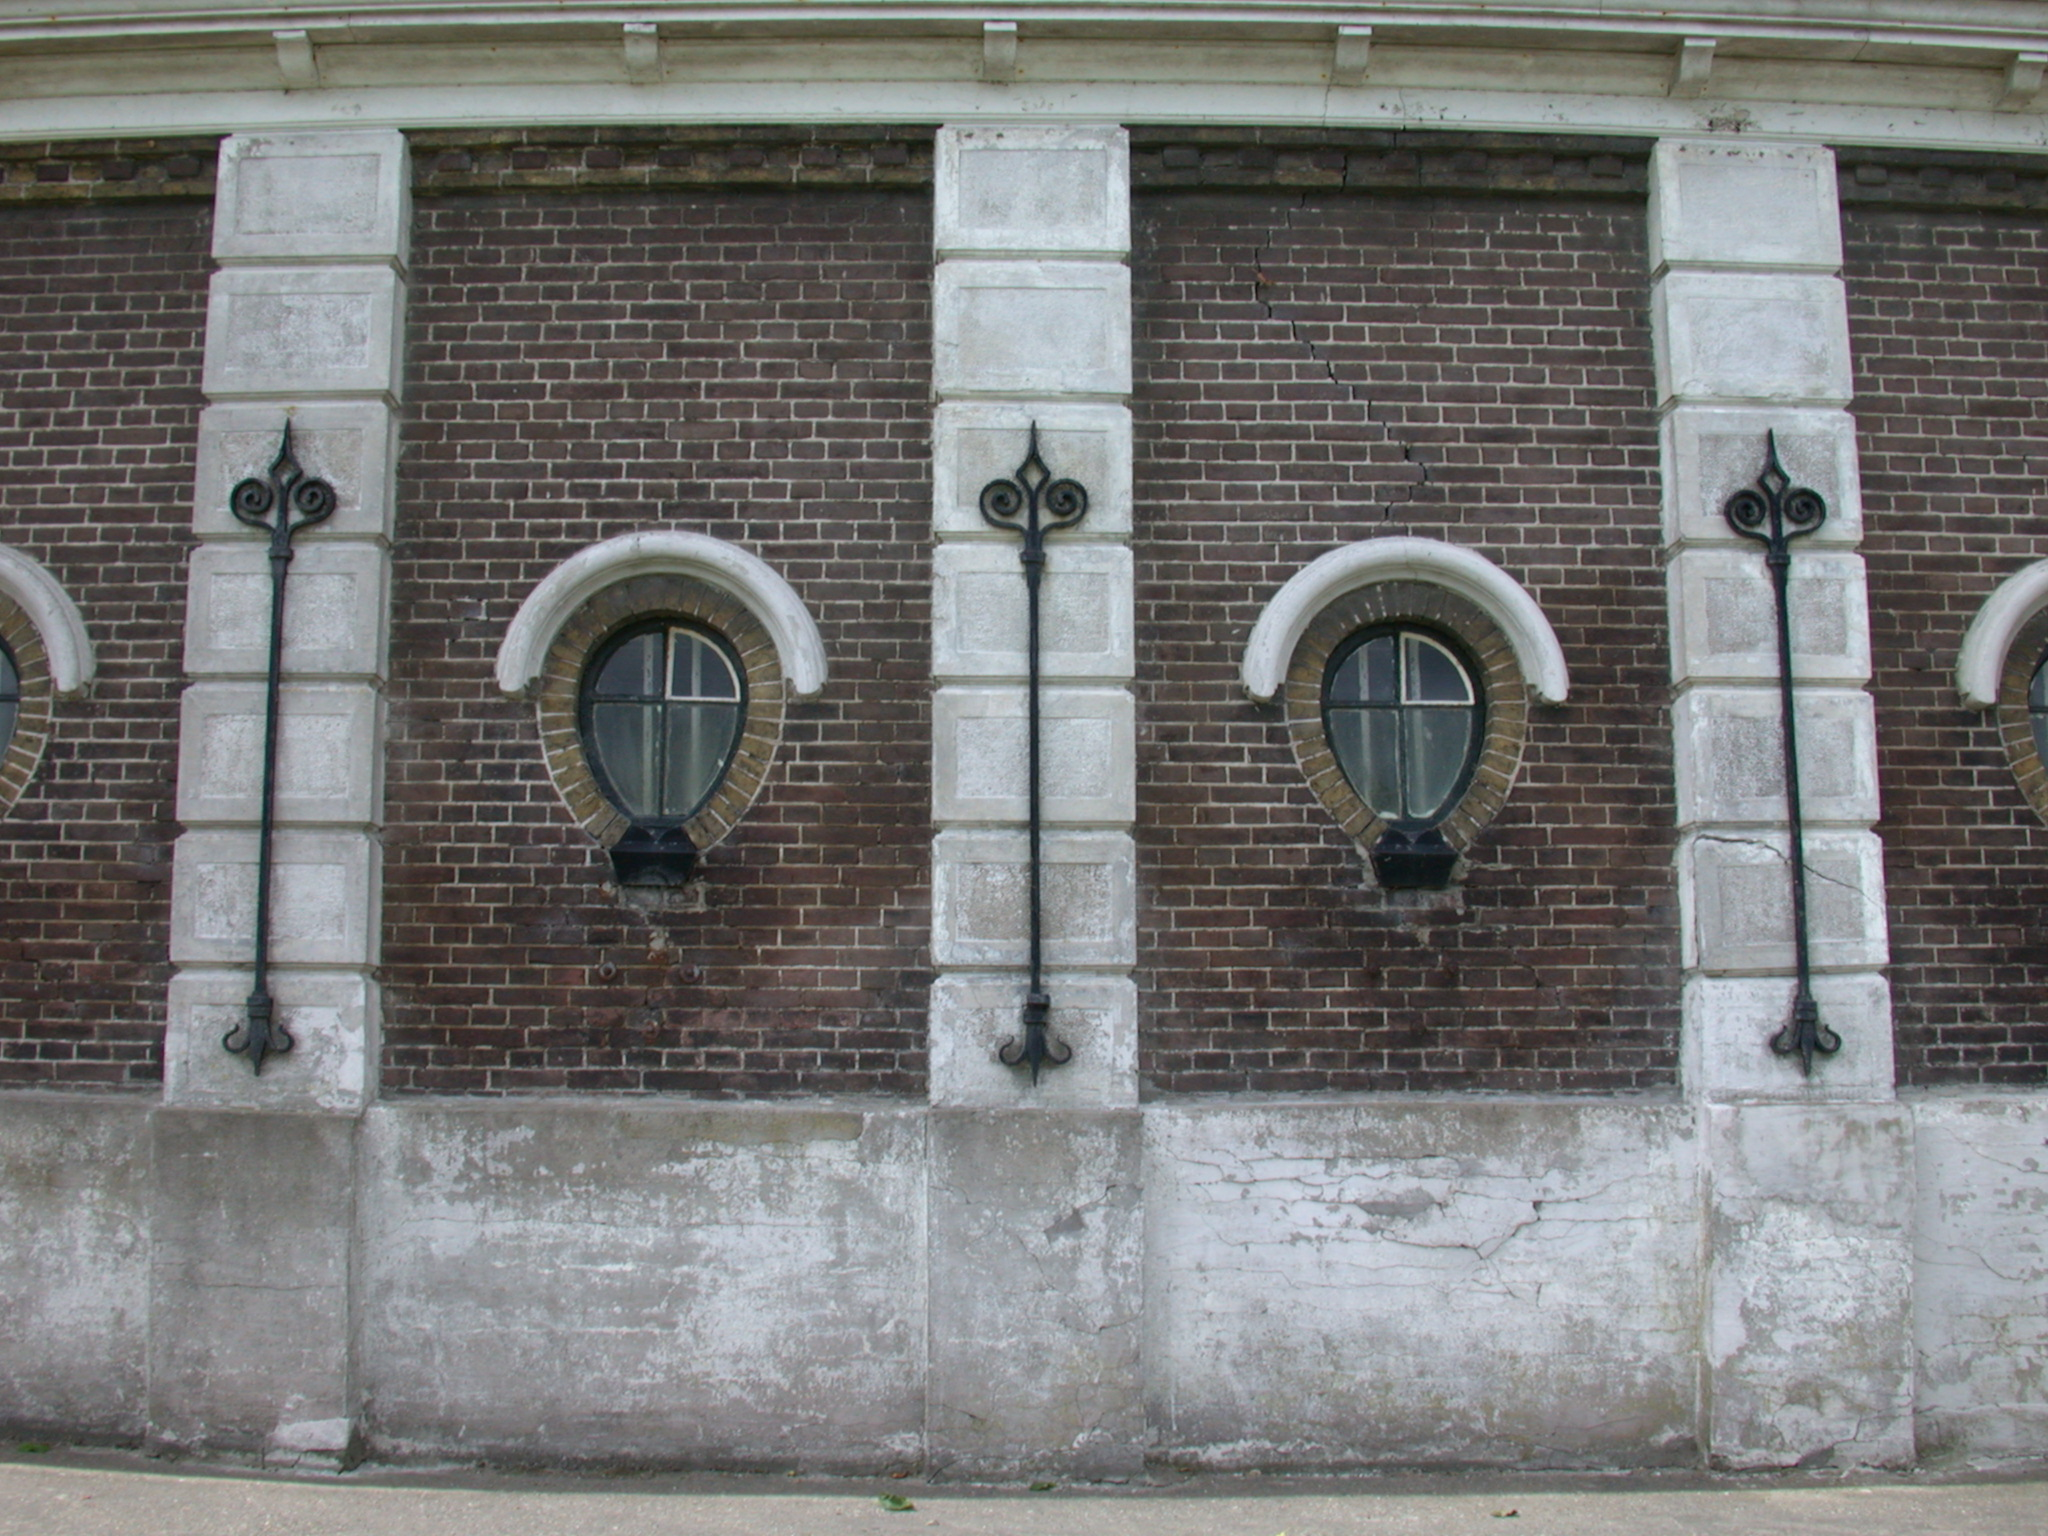 wall of classic building bricks windows